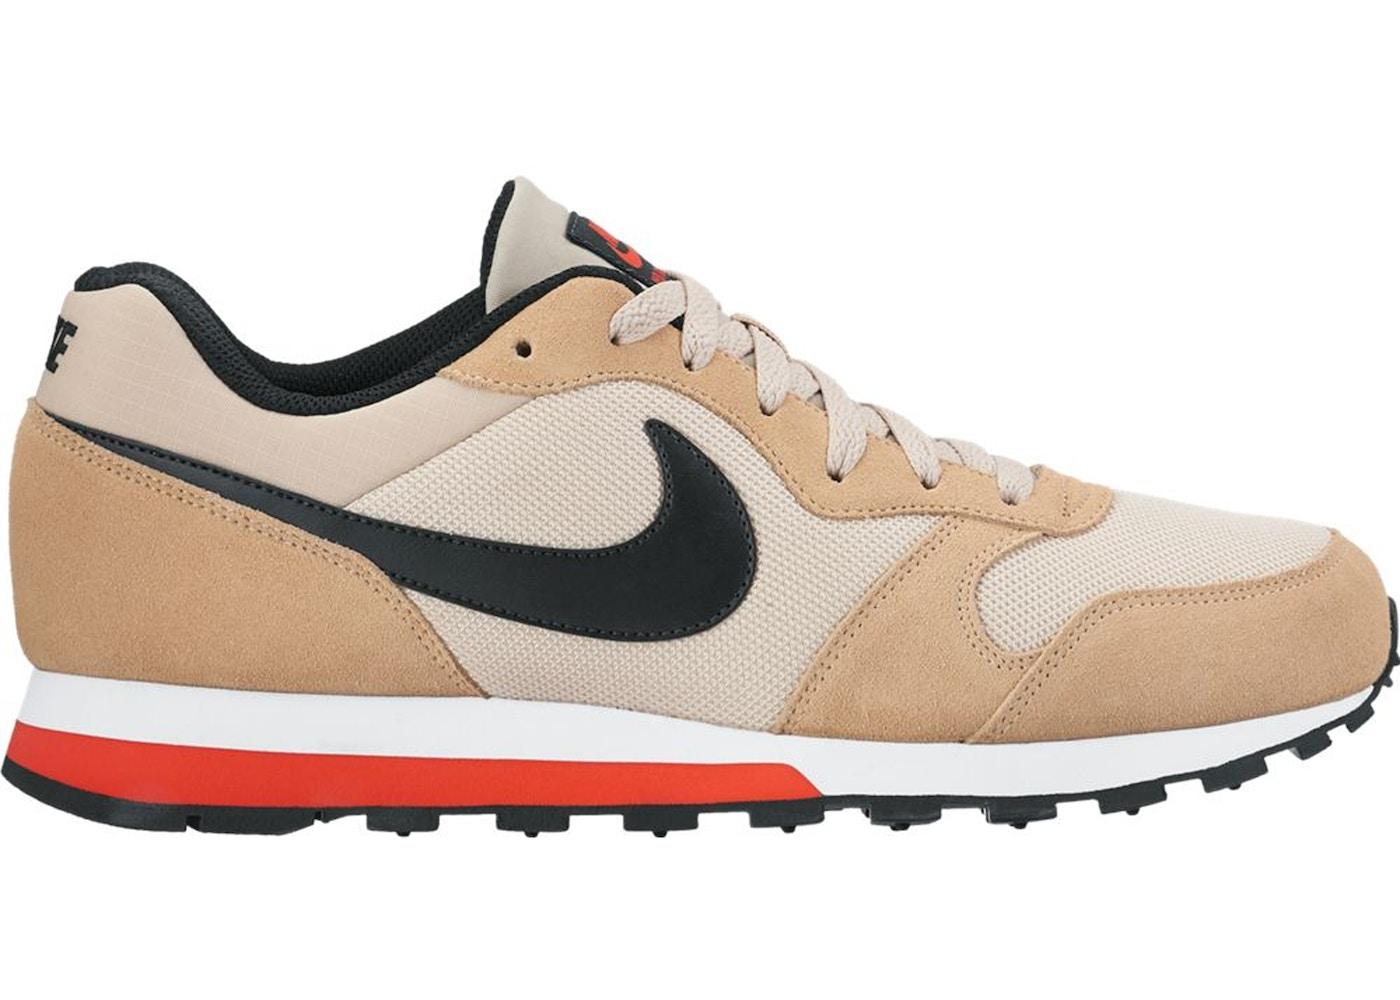 Autocomplacencia Hecho de paño  Nike MD Runner 2 Linen Black - 749794-200